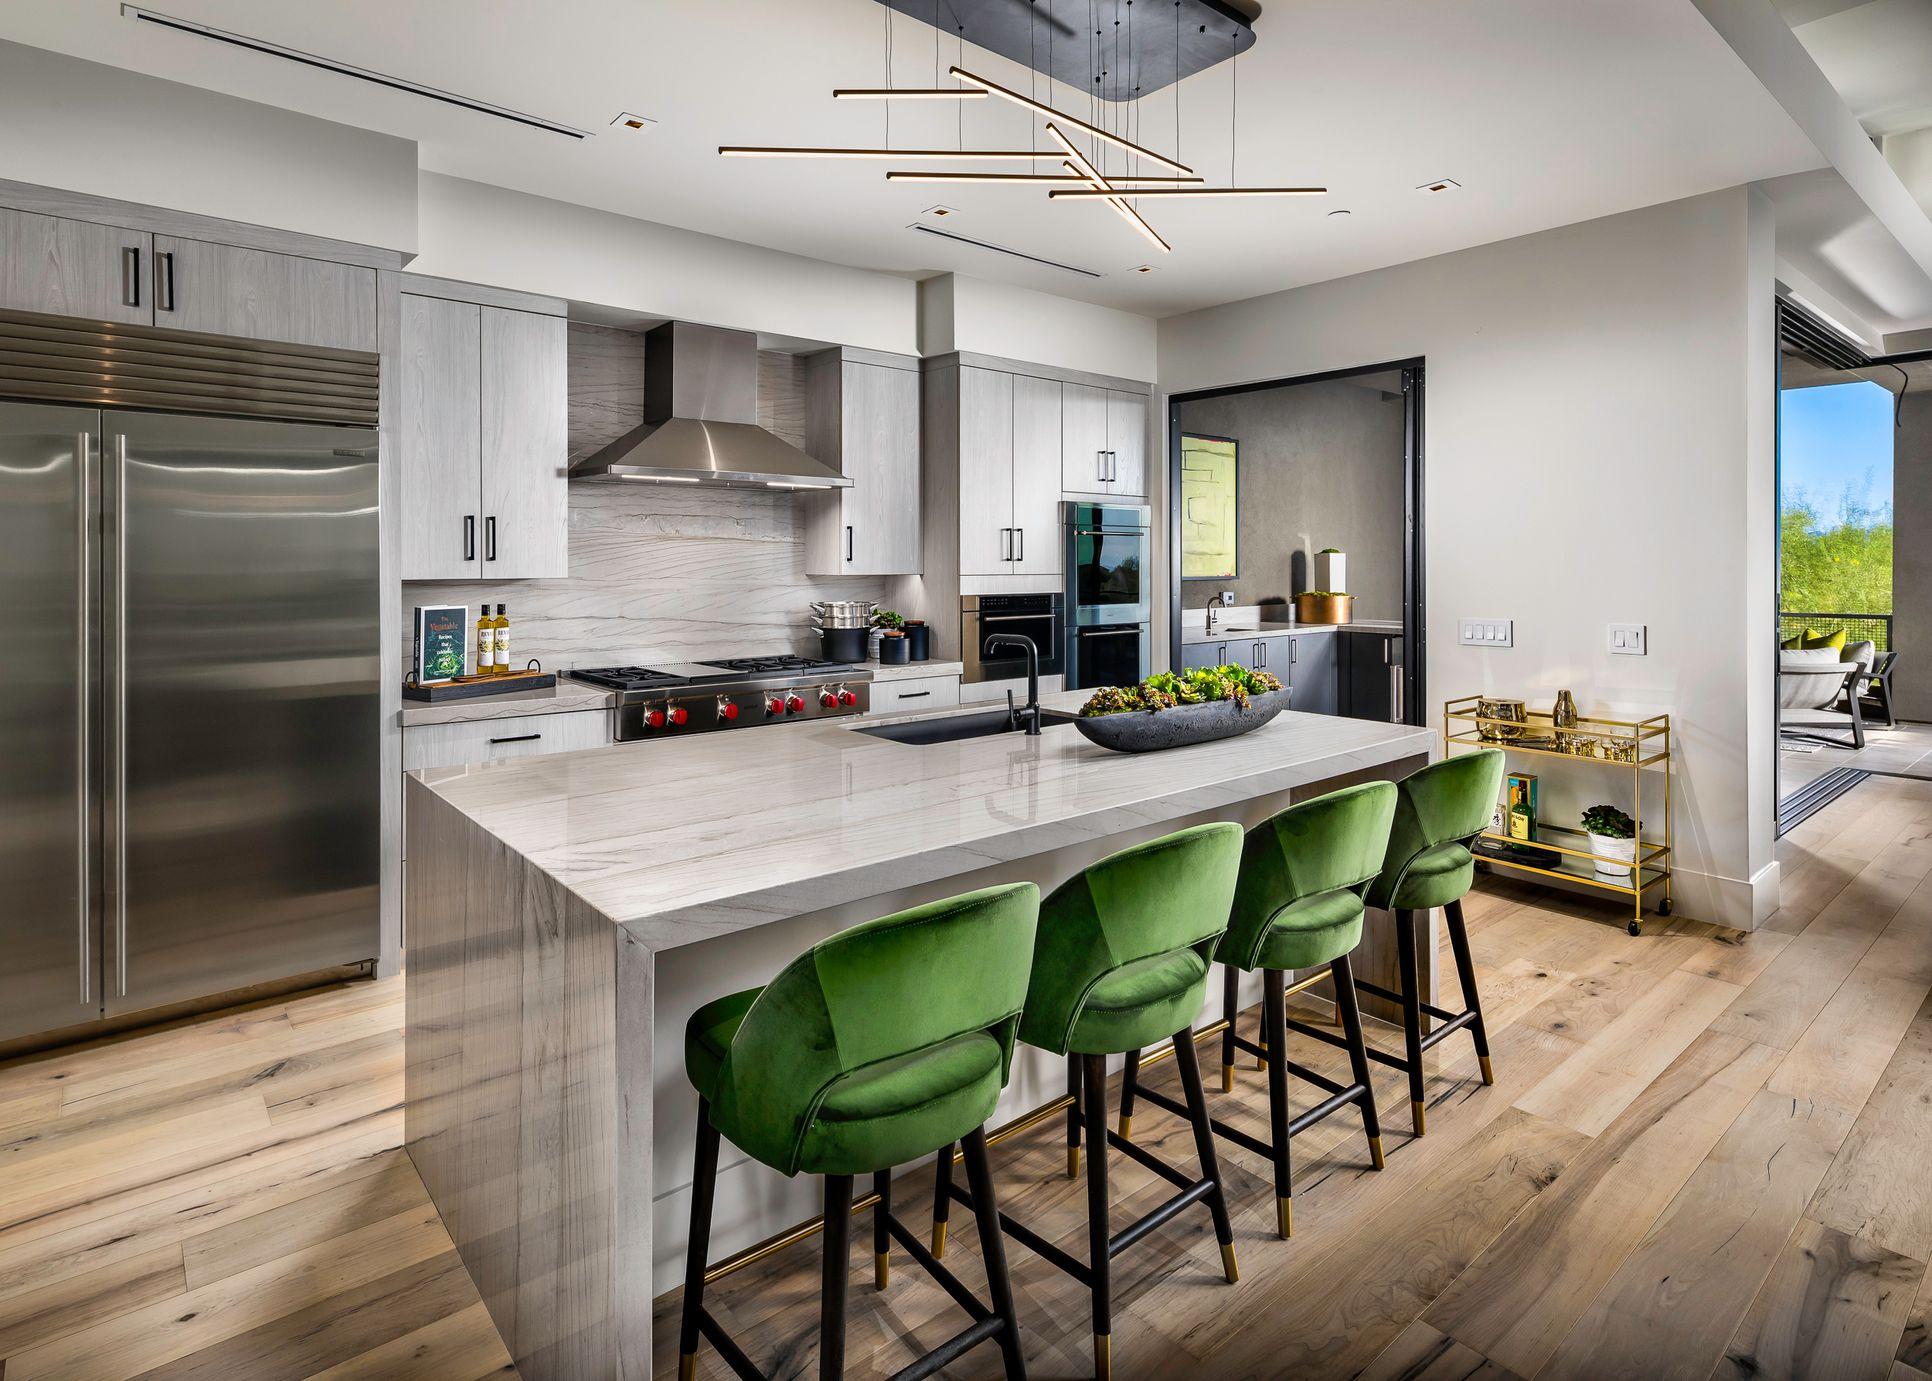 Our Zenith plan kitchen:www.theretreatatsevendesertmountain.com/models